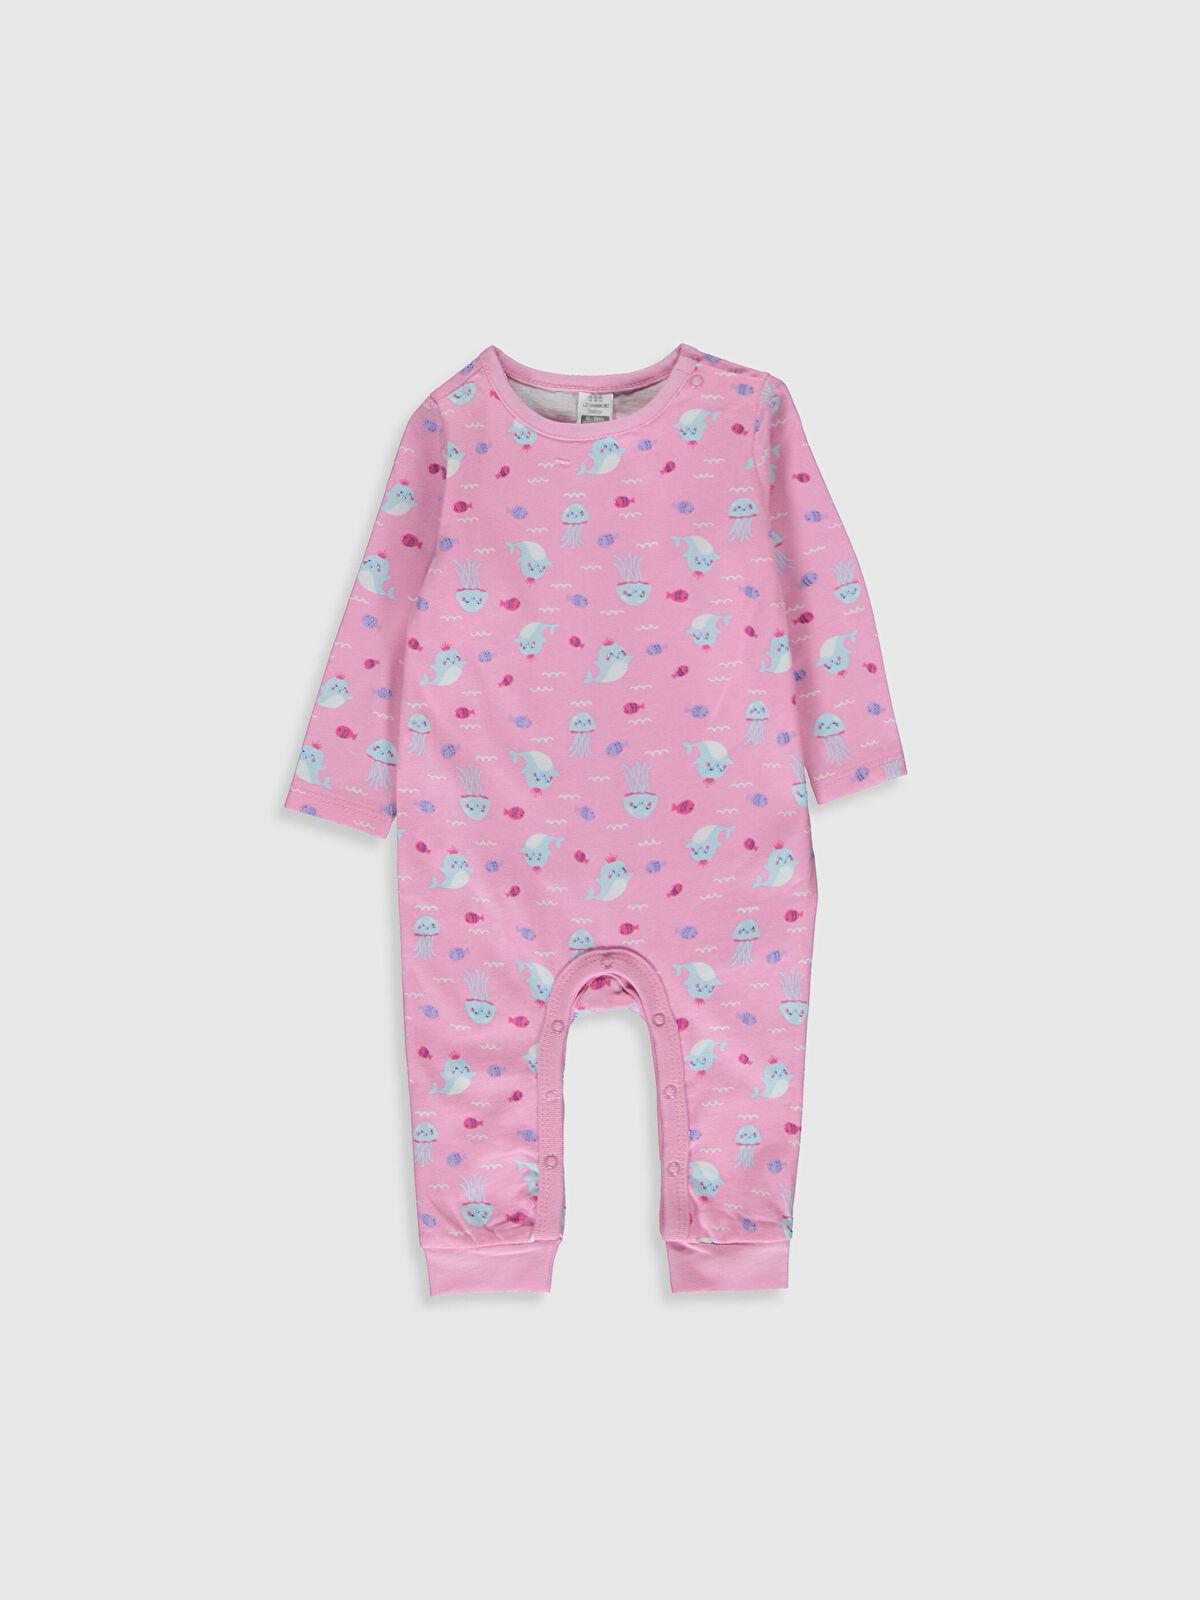 Kız Bebek Desenli Pamuklu Tulum - LC WAIKIKI